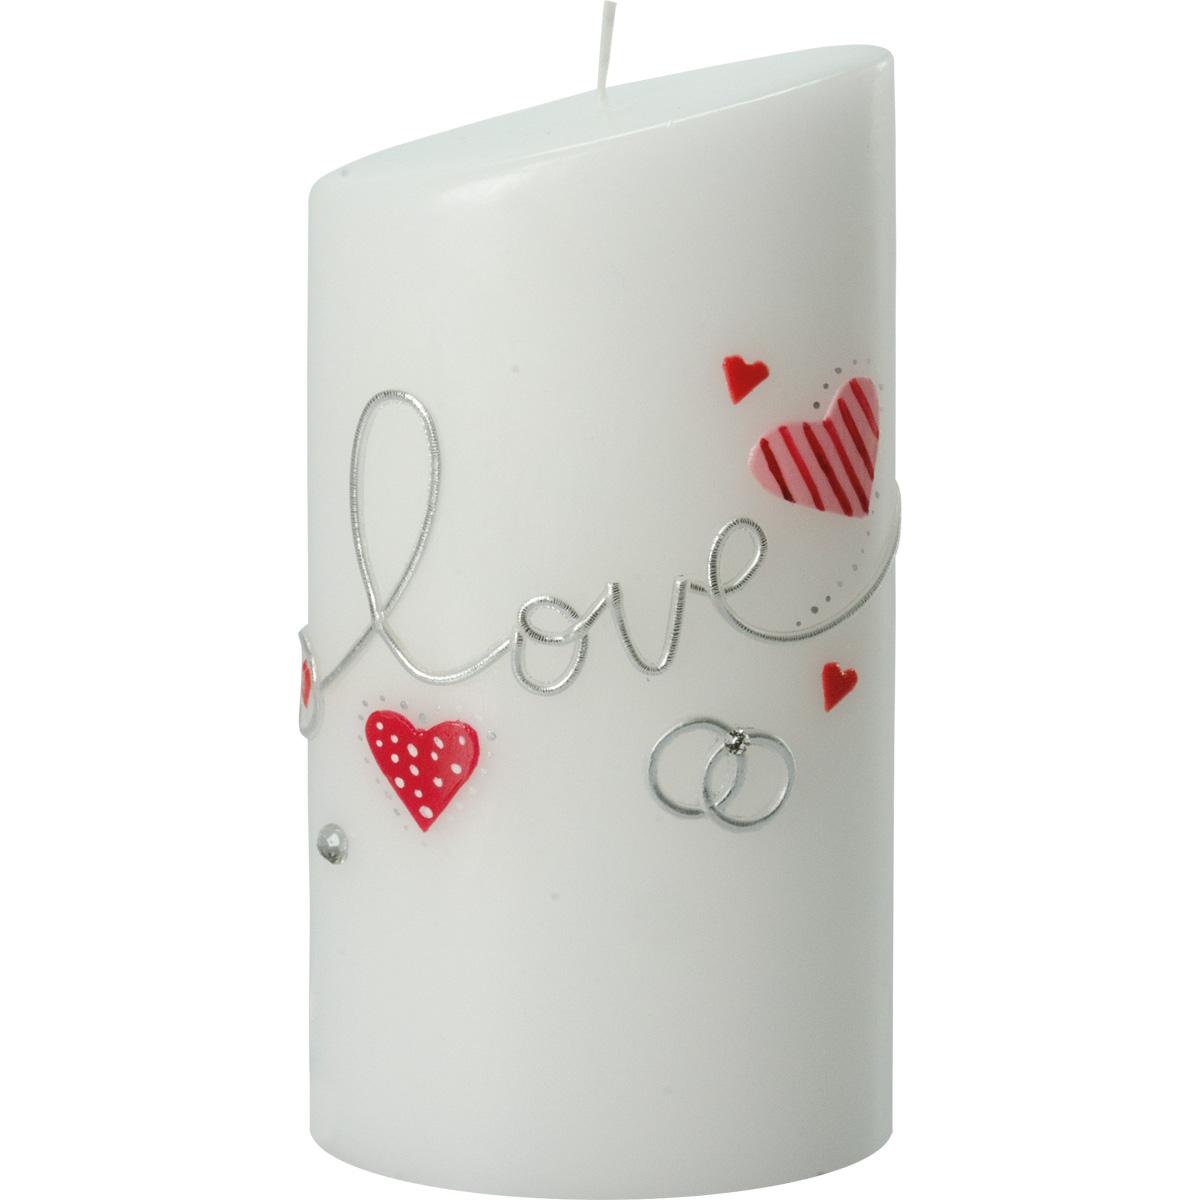 Hochzeitskerze, 5001, Oval 180x90x60, -love-, rote Herzen, silber